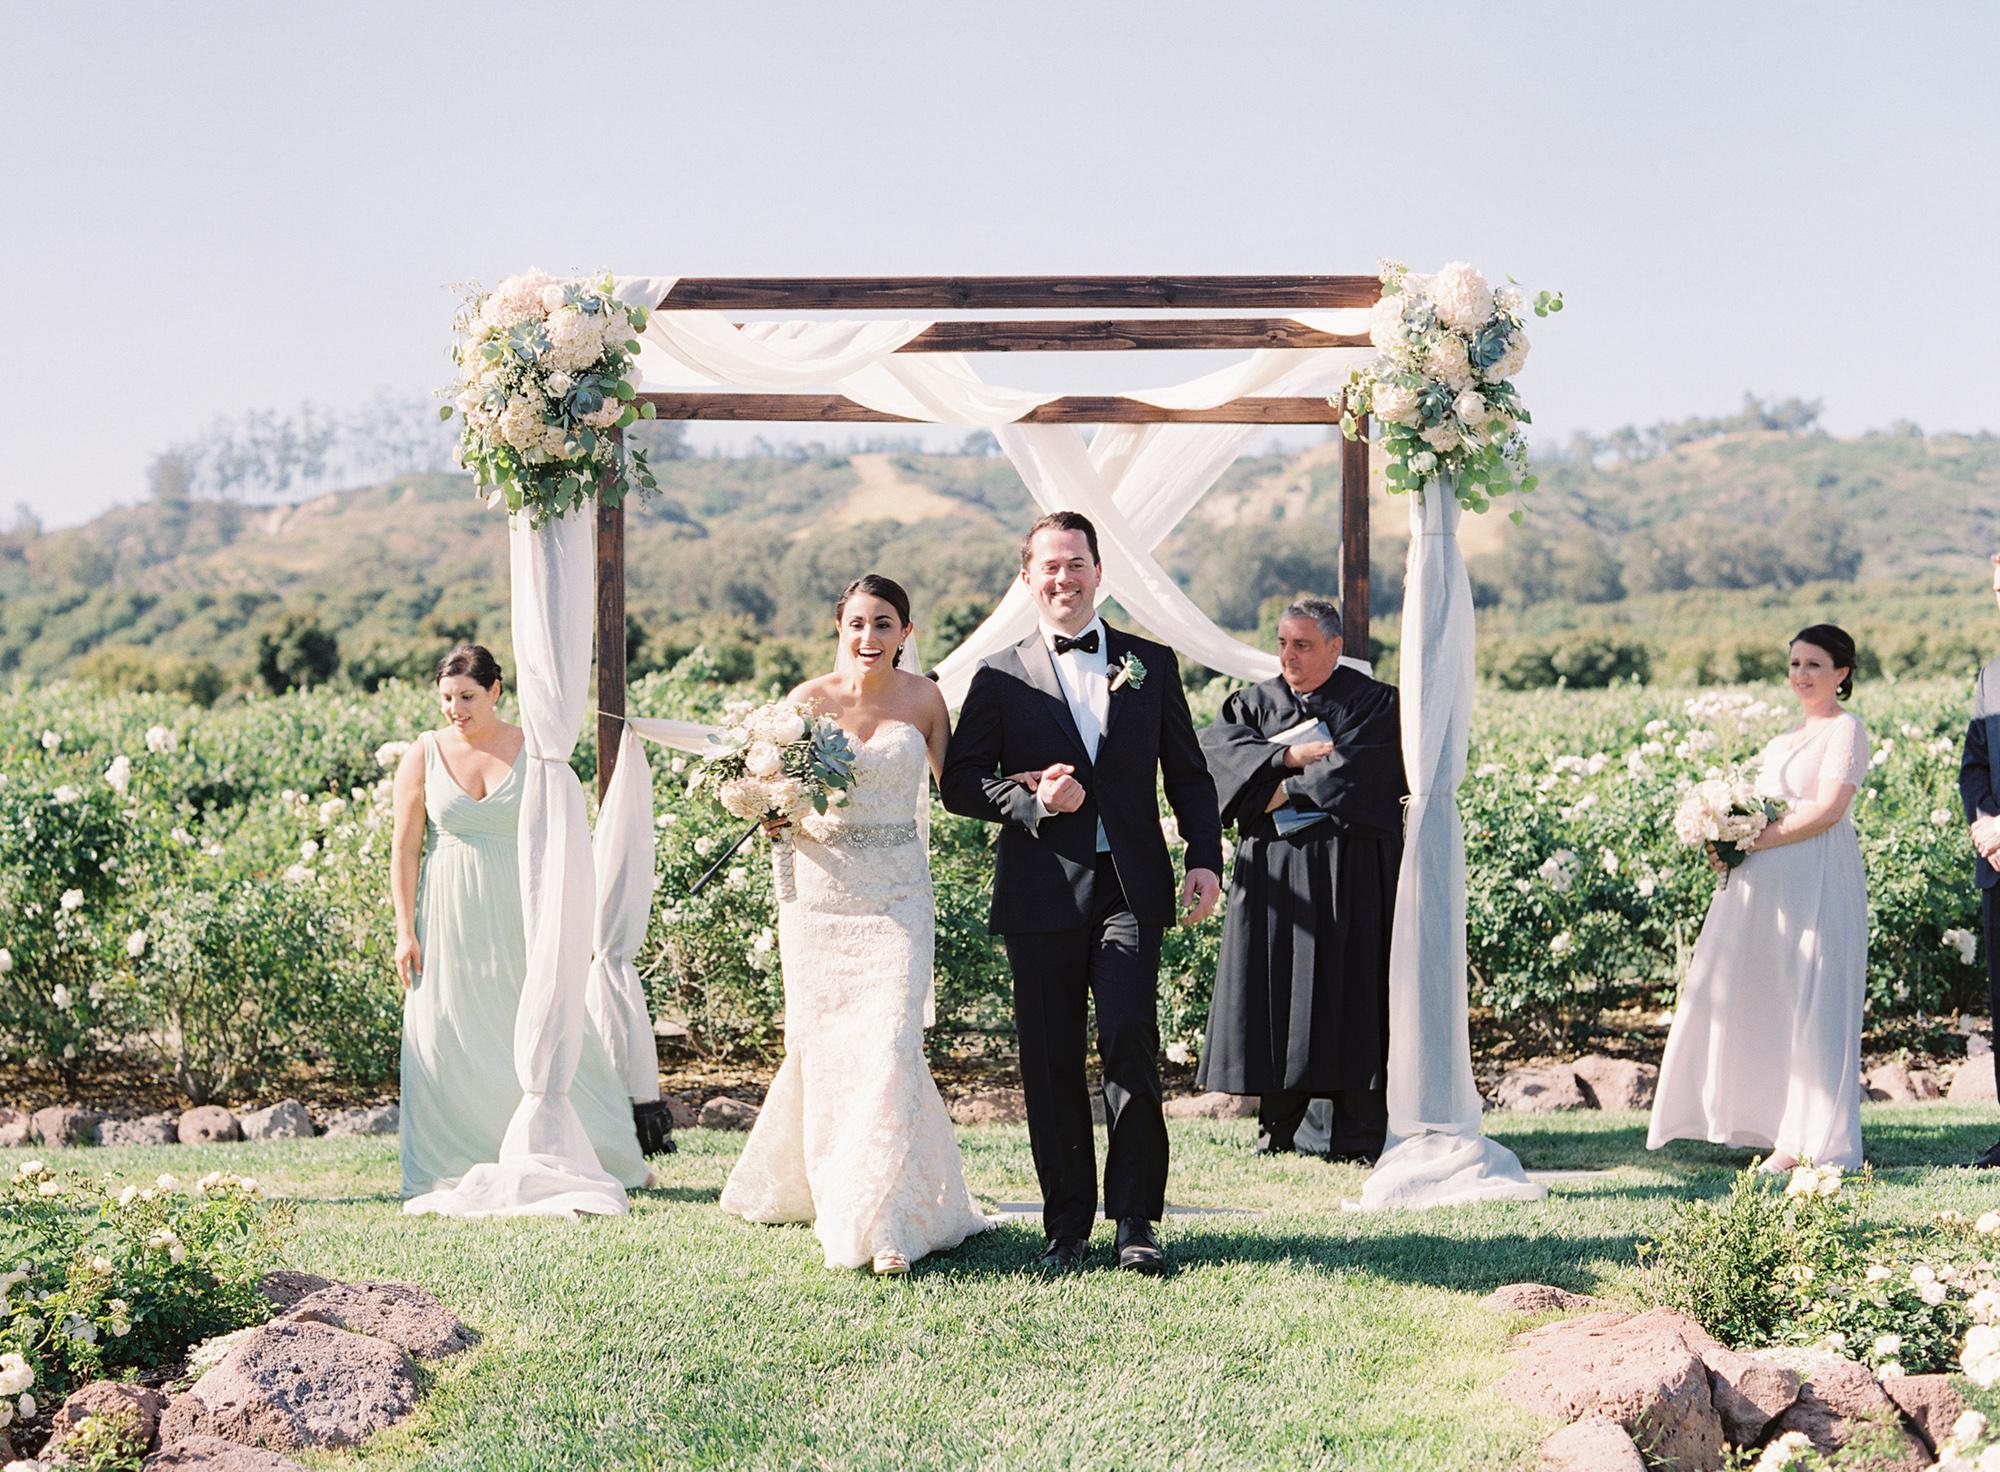 Gerry-Ranch-Wedding-Photography-Kristina-Adams-17.jpg